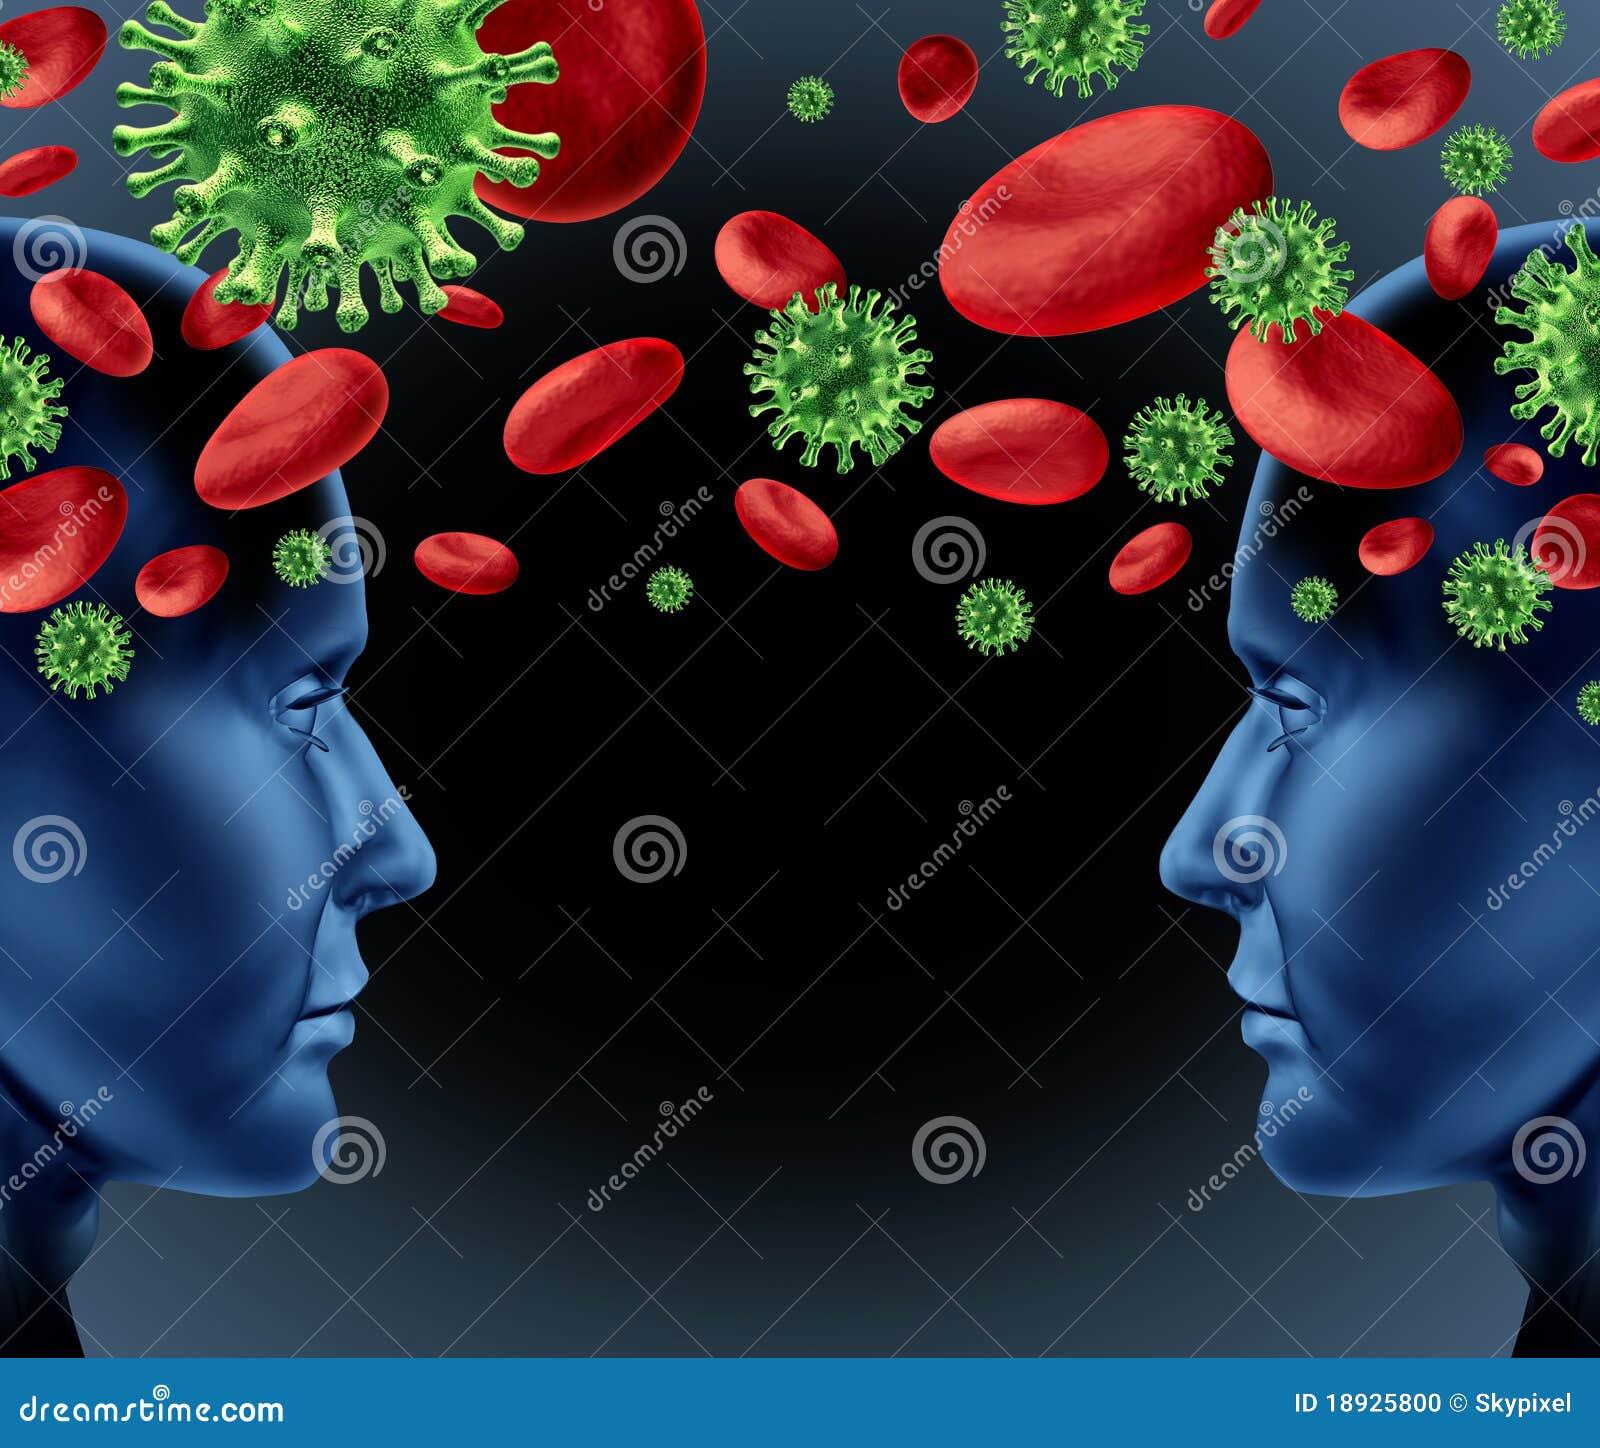 virusi contagiosi